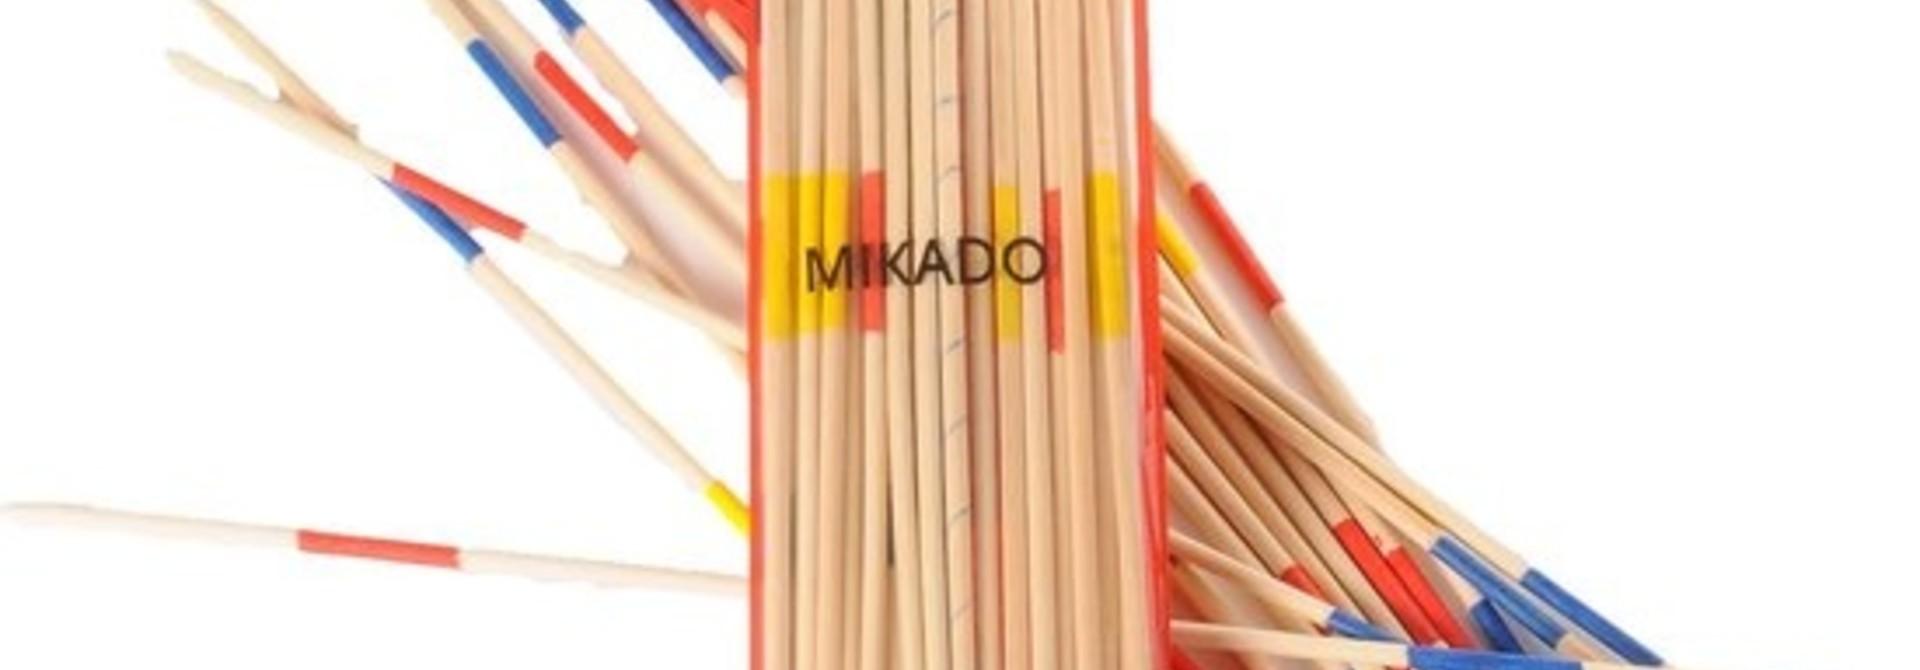 Mikado groot